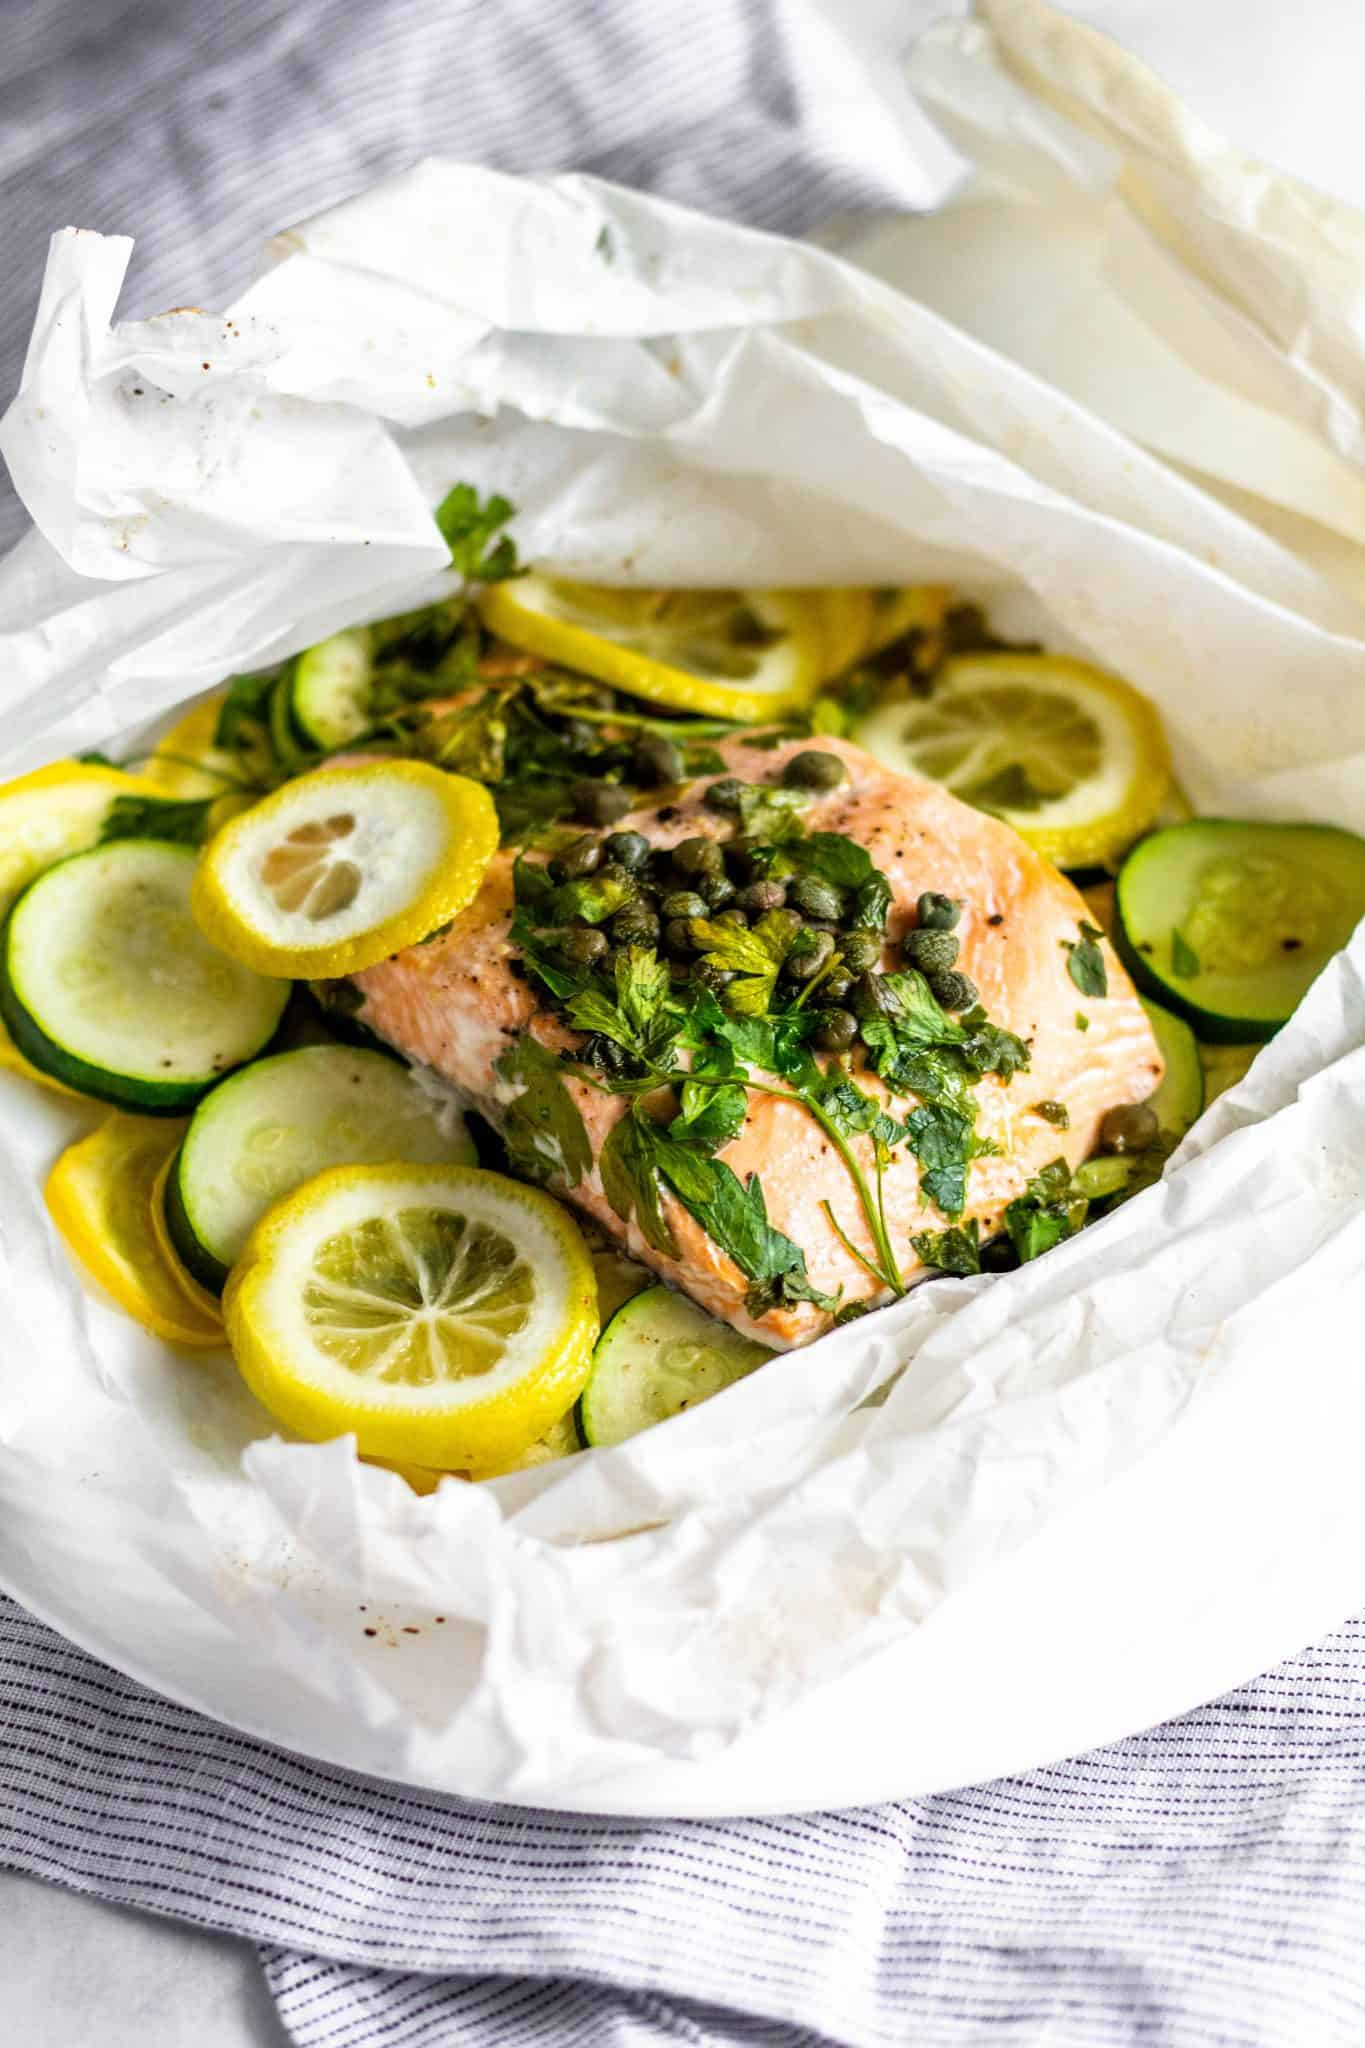 Lemon-Caper Fish and Veggies En Papillote #tararochfordnutrition #healthydinner